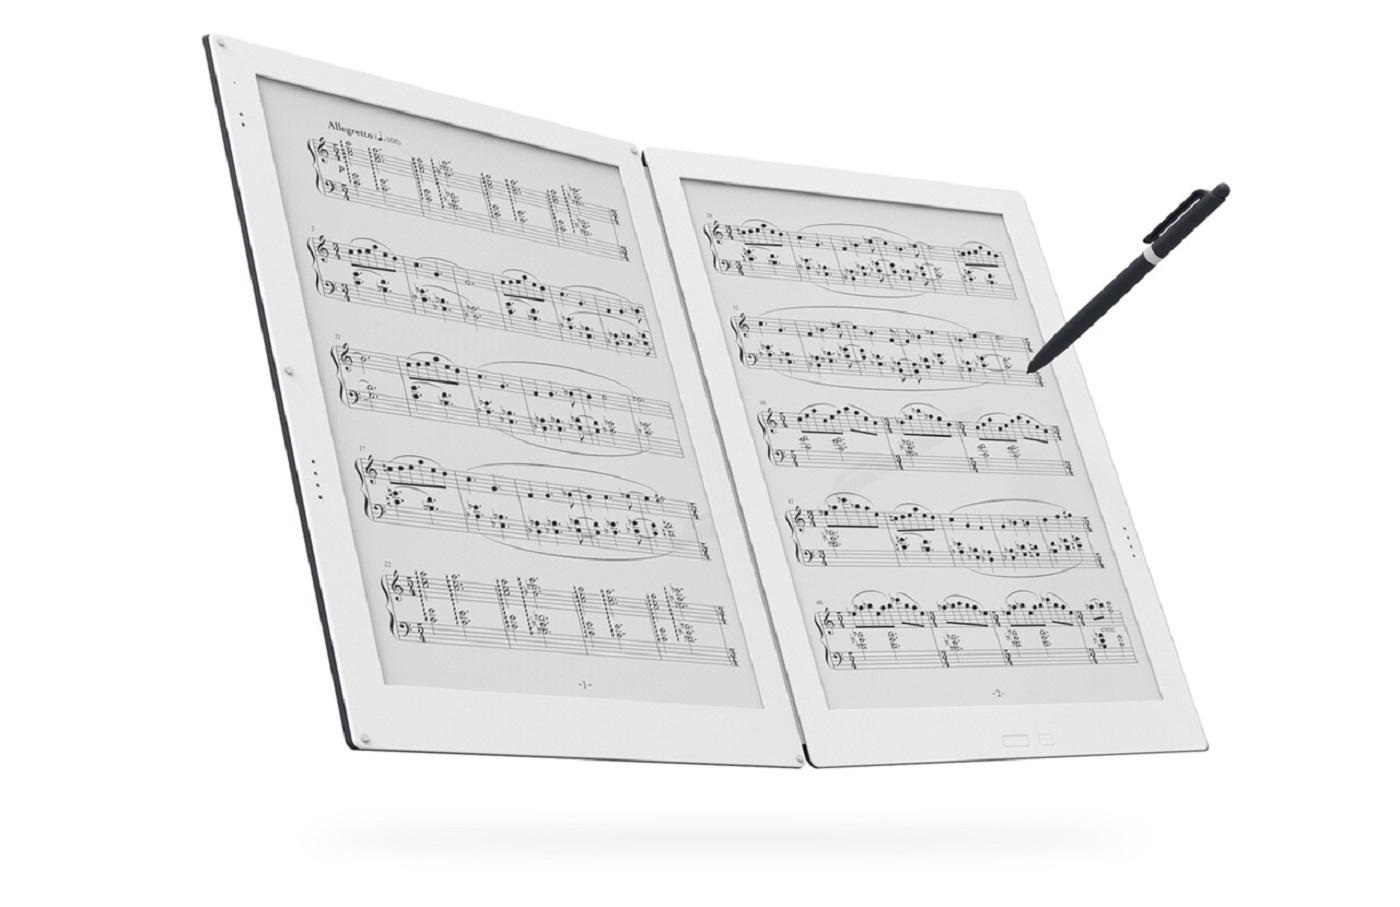 Gvido 電子紙樂譜平板上市價位確定為 US$1,600